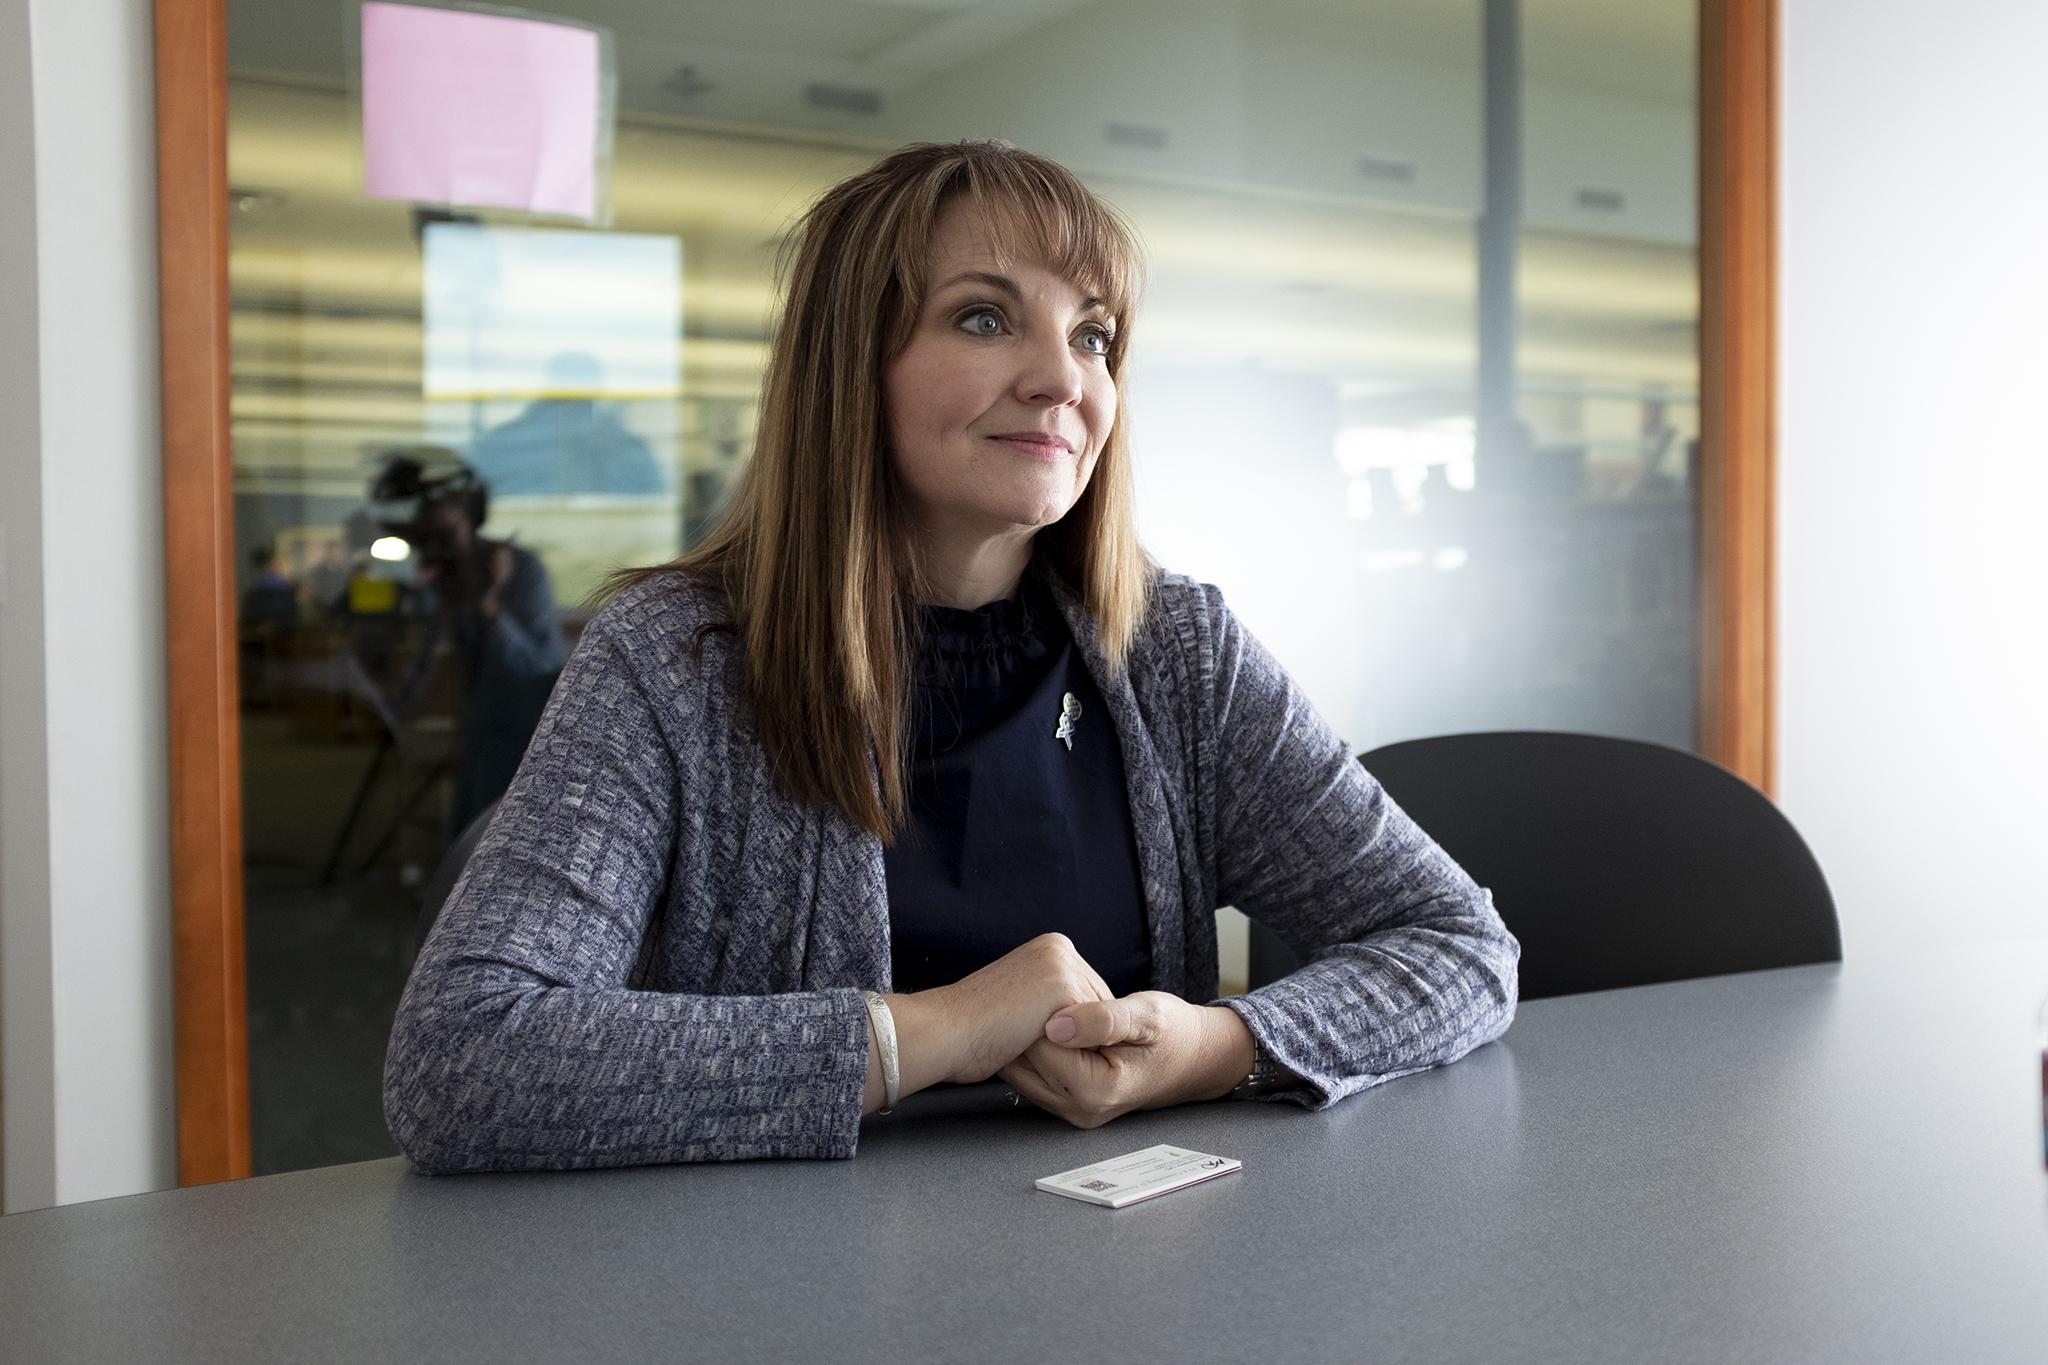 <p>Coni Sanders speaks to reporters inside Columbine High School, March 23, 2019.</p>